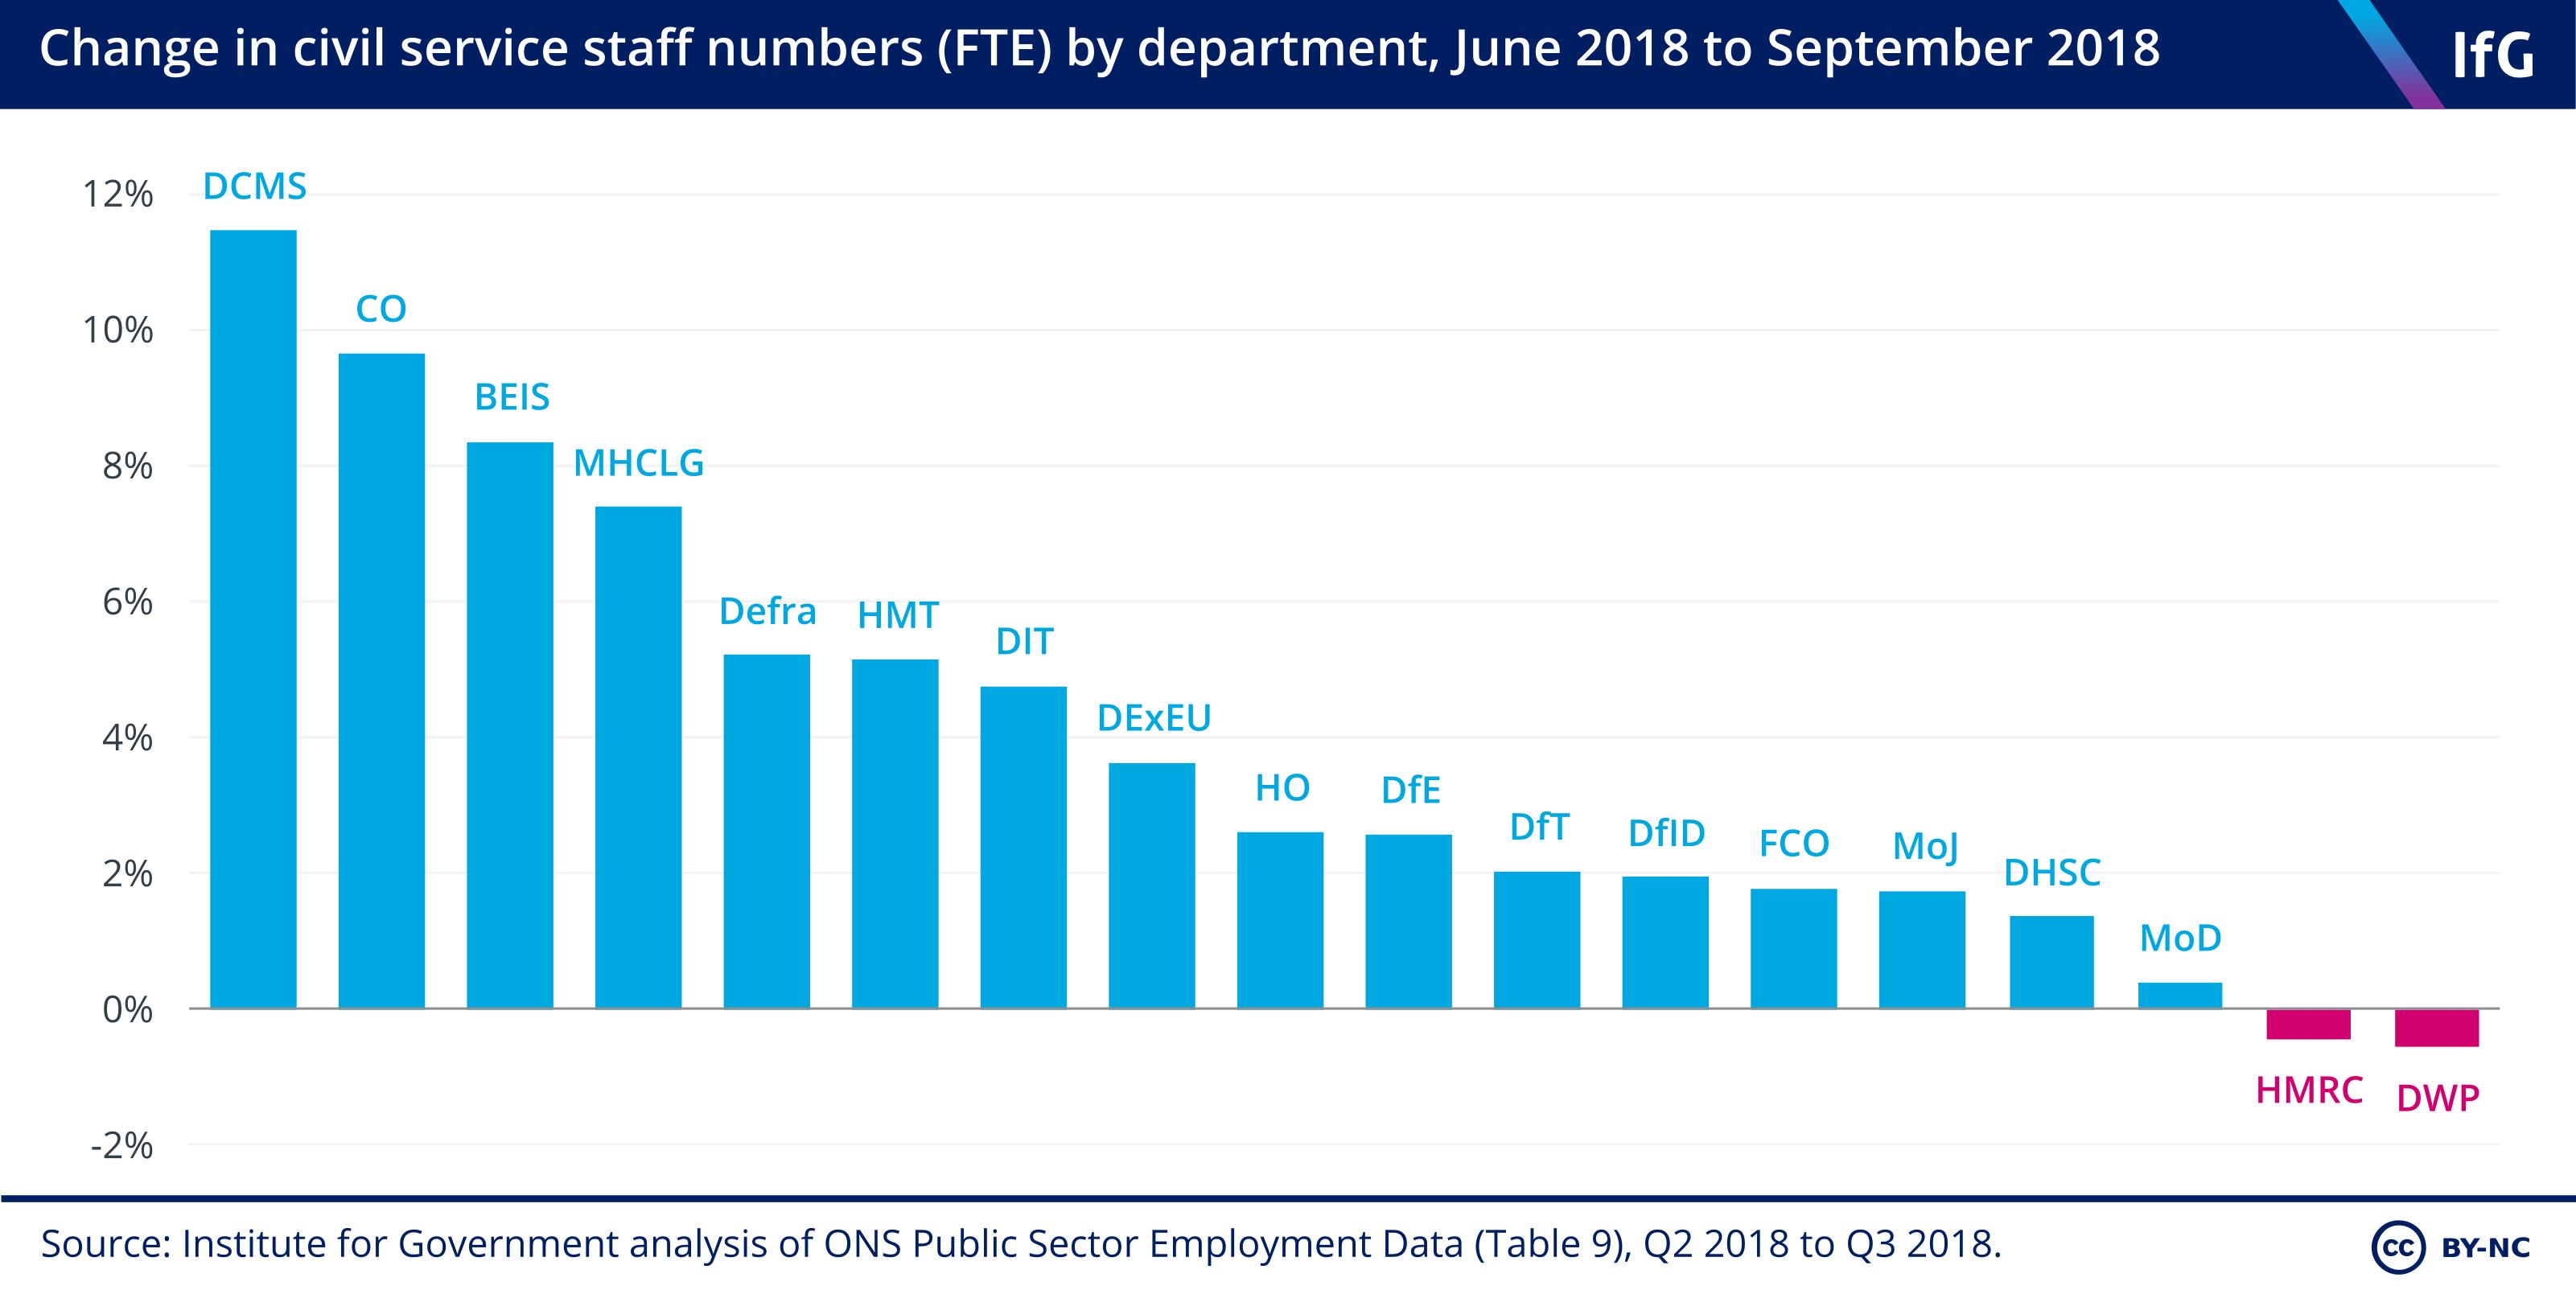 Departmental change Q2 2018 to Q3 2018